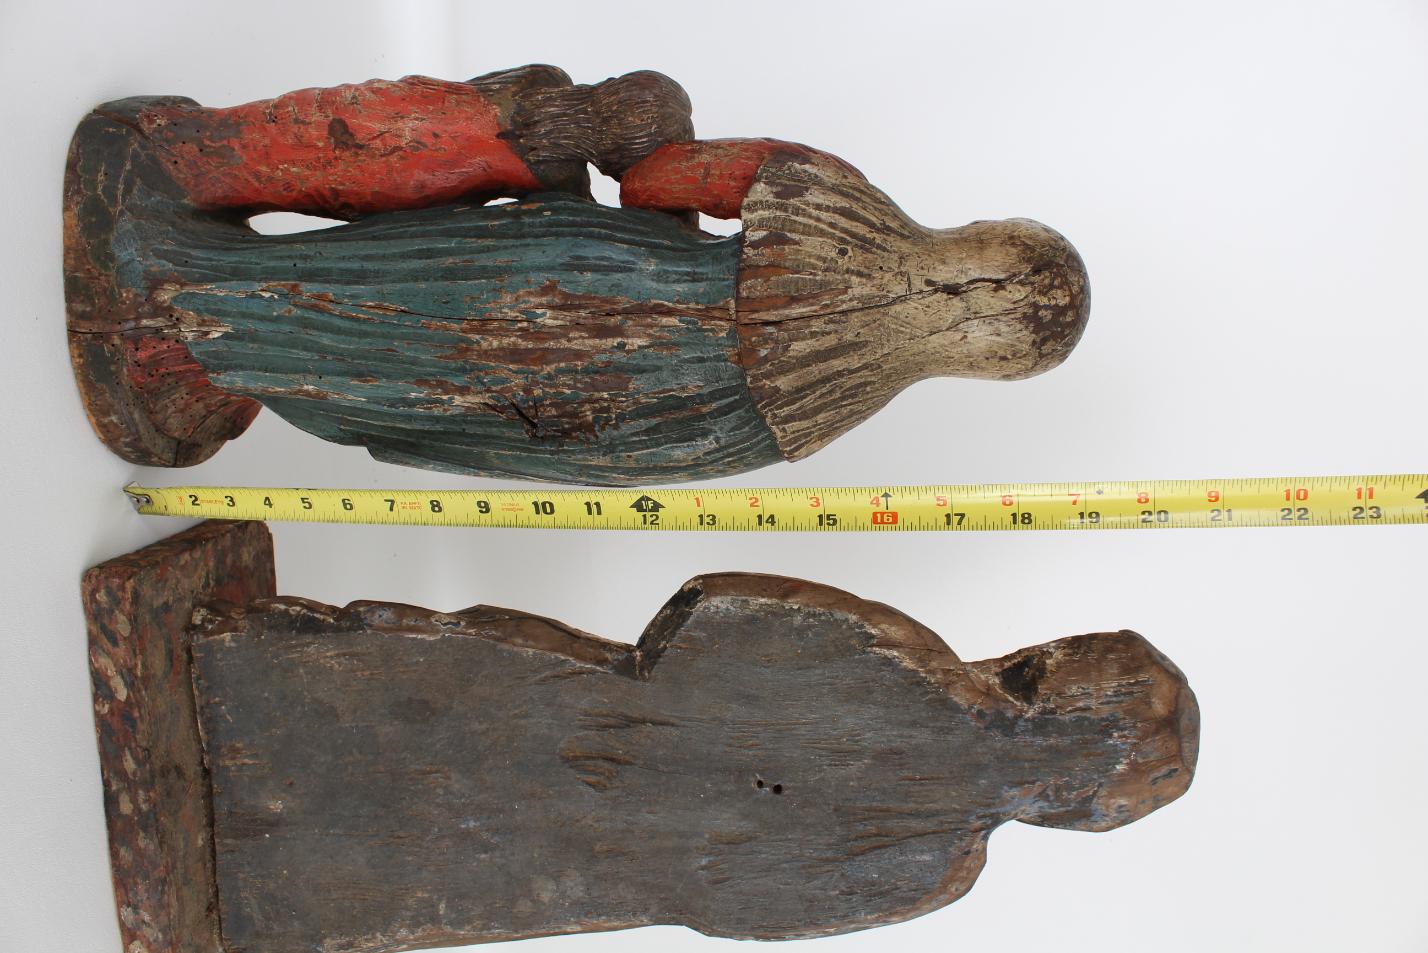 (2) Antique Carved Spanish Santos Figures - Image 4 of 4